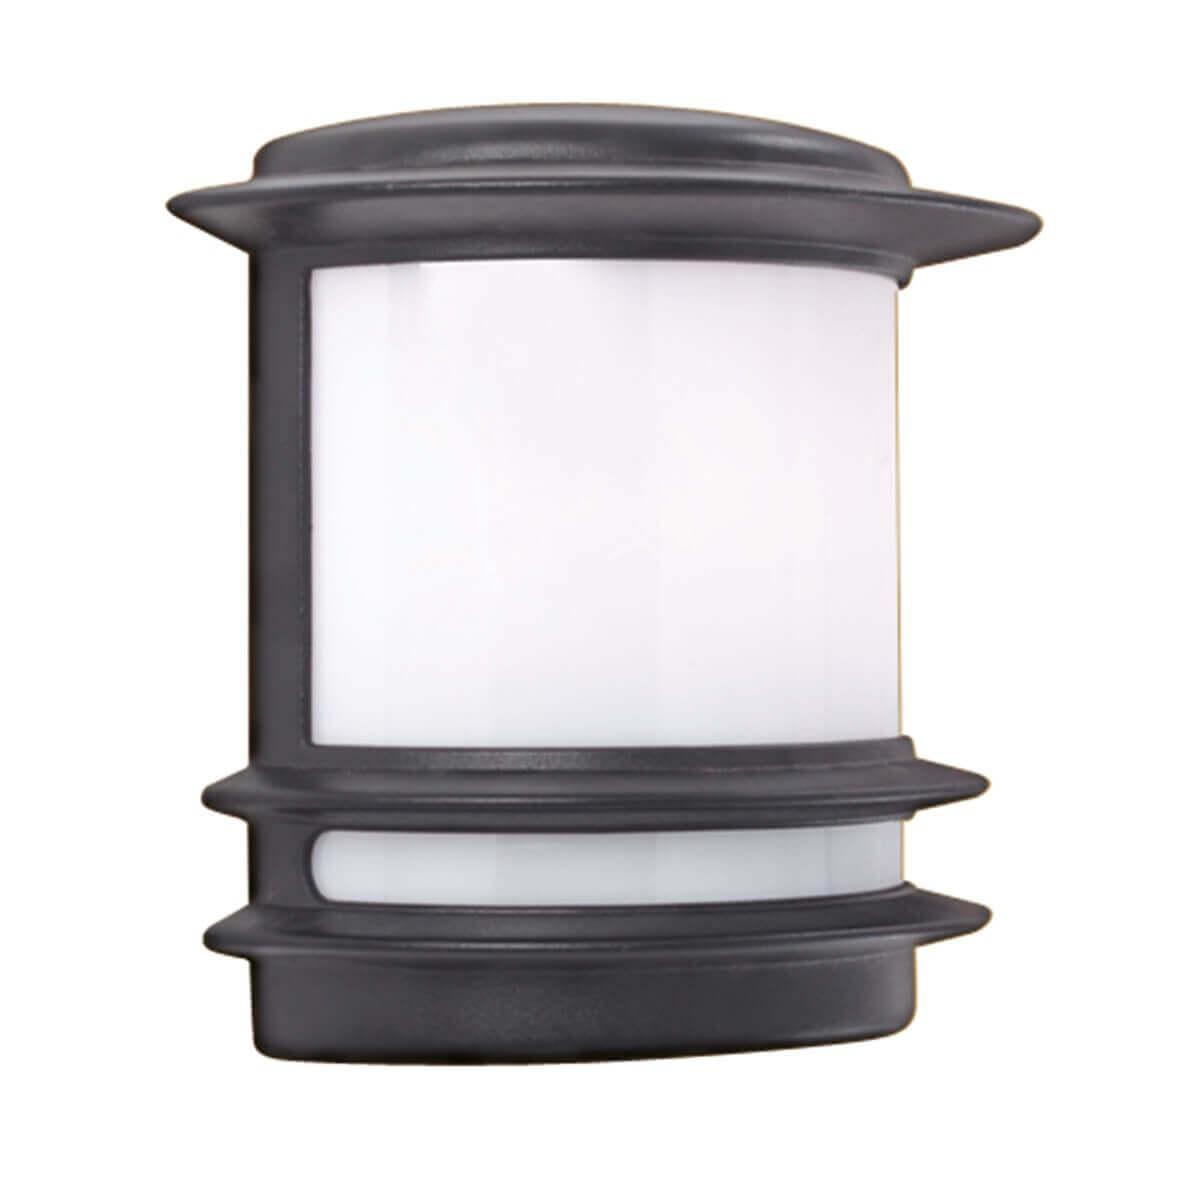 Stroud 1 Light Outdoor Wall Bracket Black White Polycarbonate Ledlam Lighting